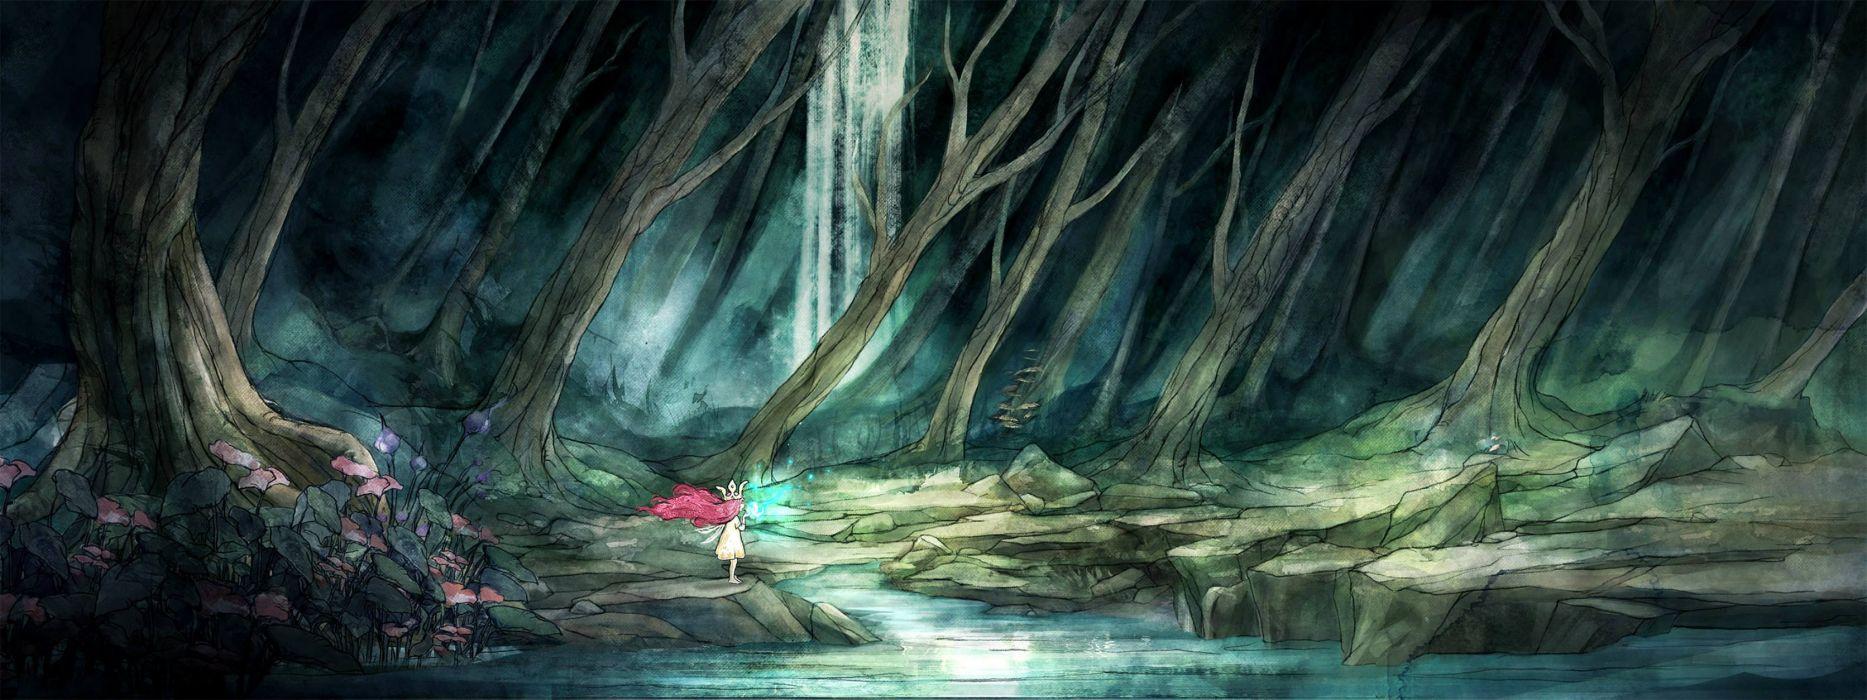 CHILD OF LIGHT Fantasy Game H Wallpaper 3344x1254